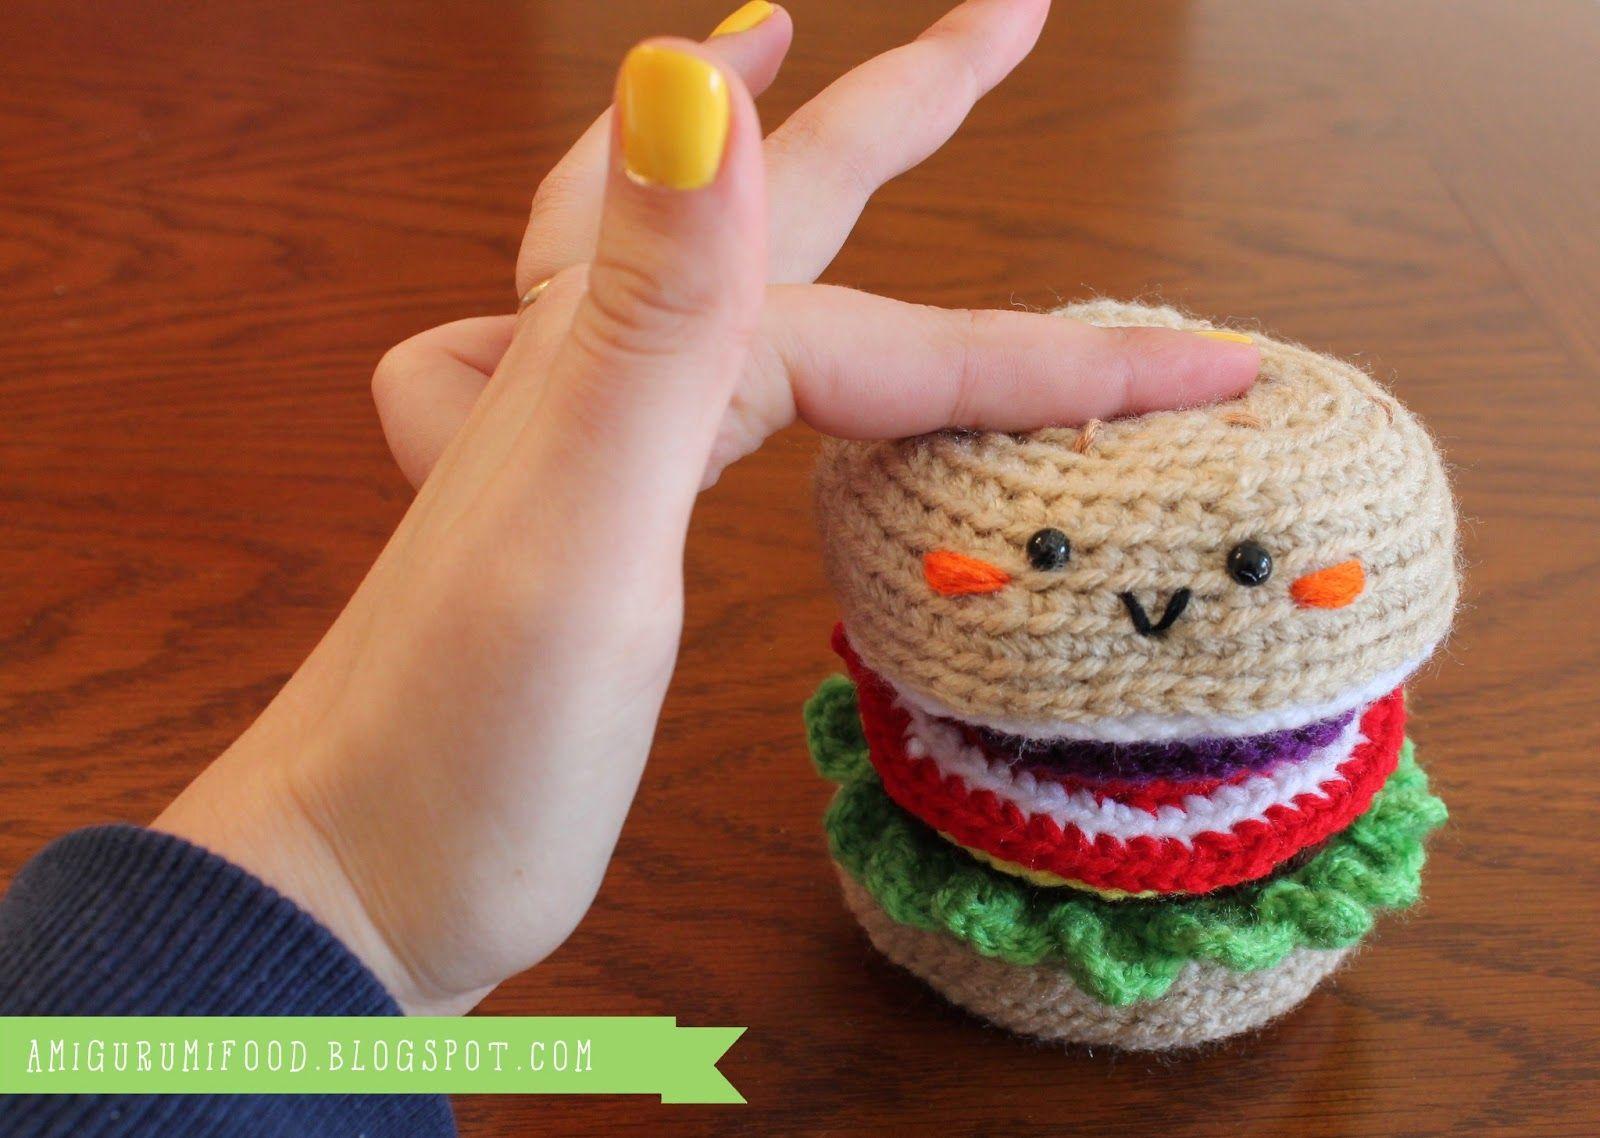 Cheeseburger Amigurumi Free Pattern-Hamburguesa Amigurumi | Crochet ...